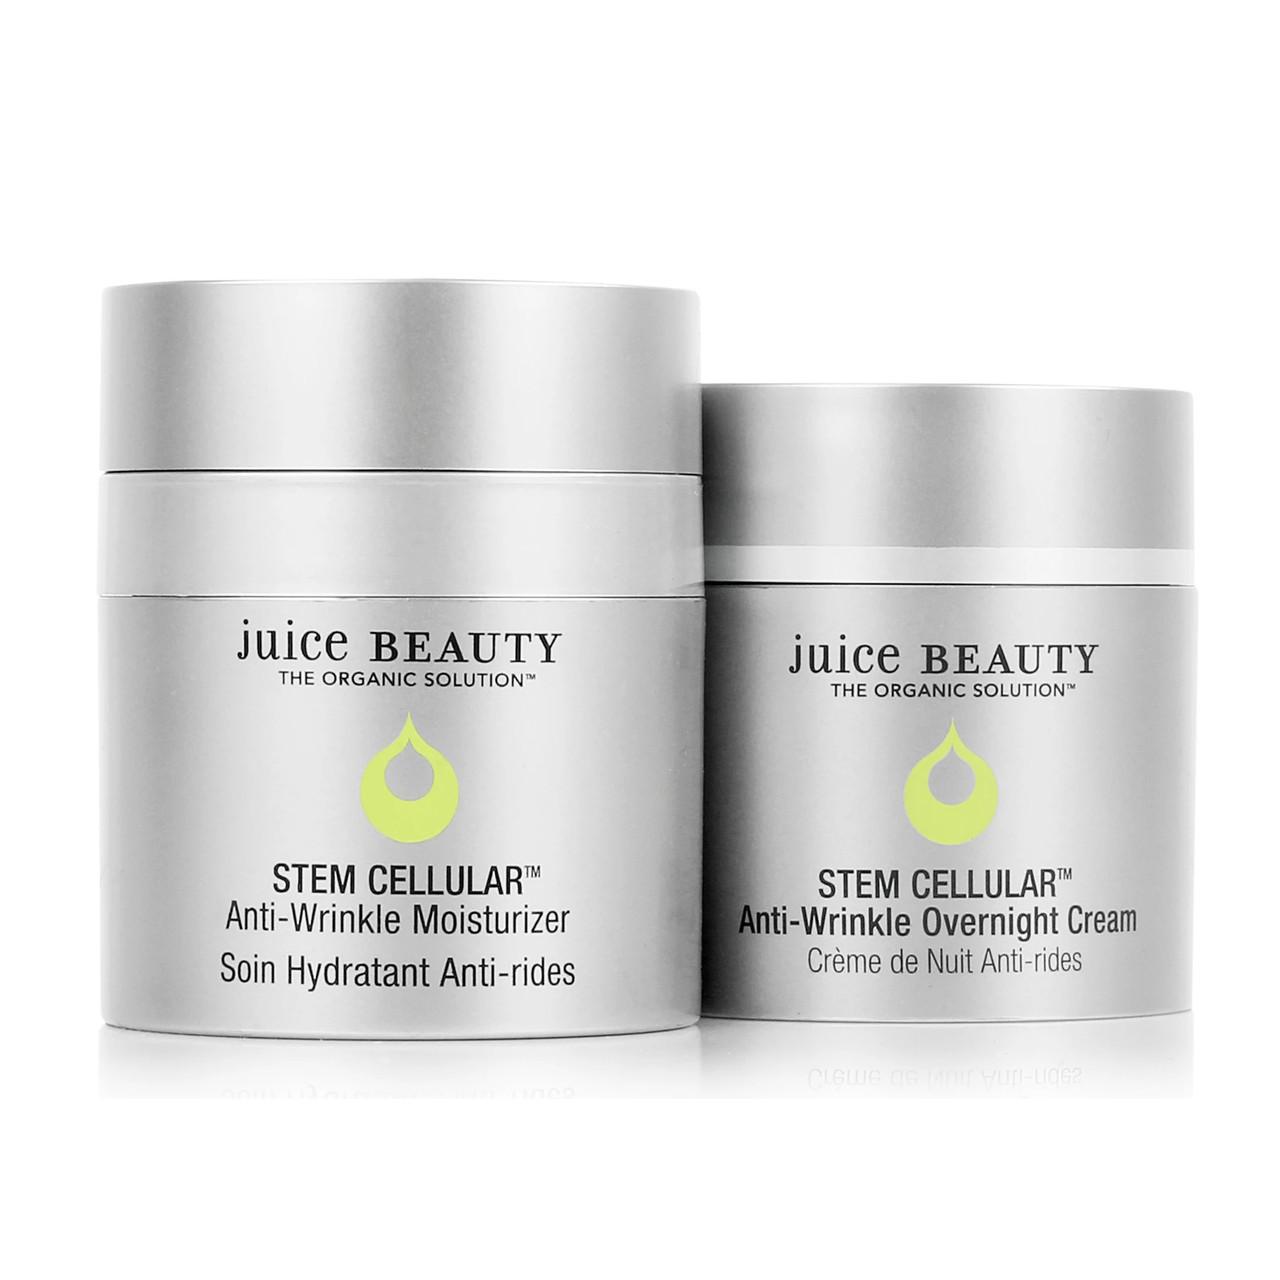 Juice Beauty Stem Cellular Day & Night Duo